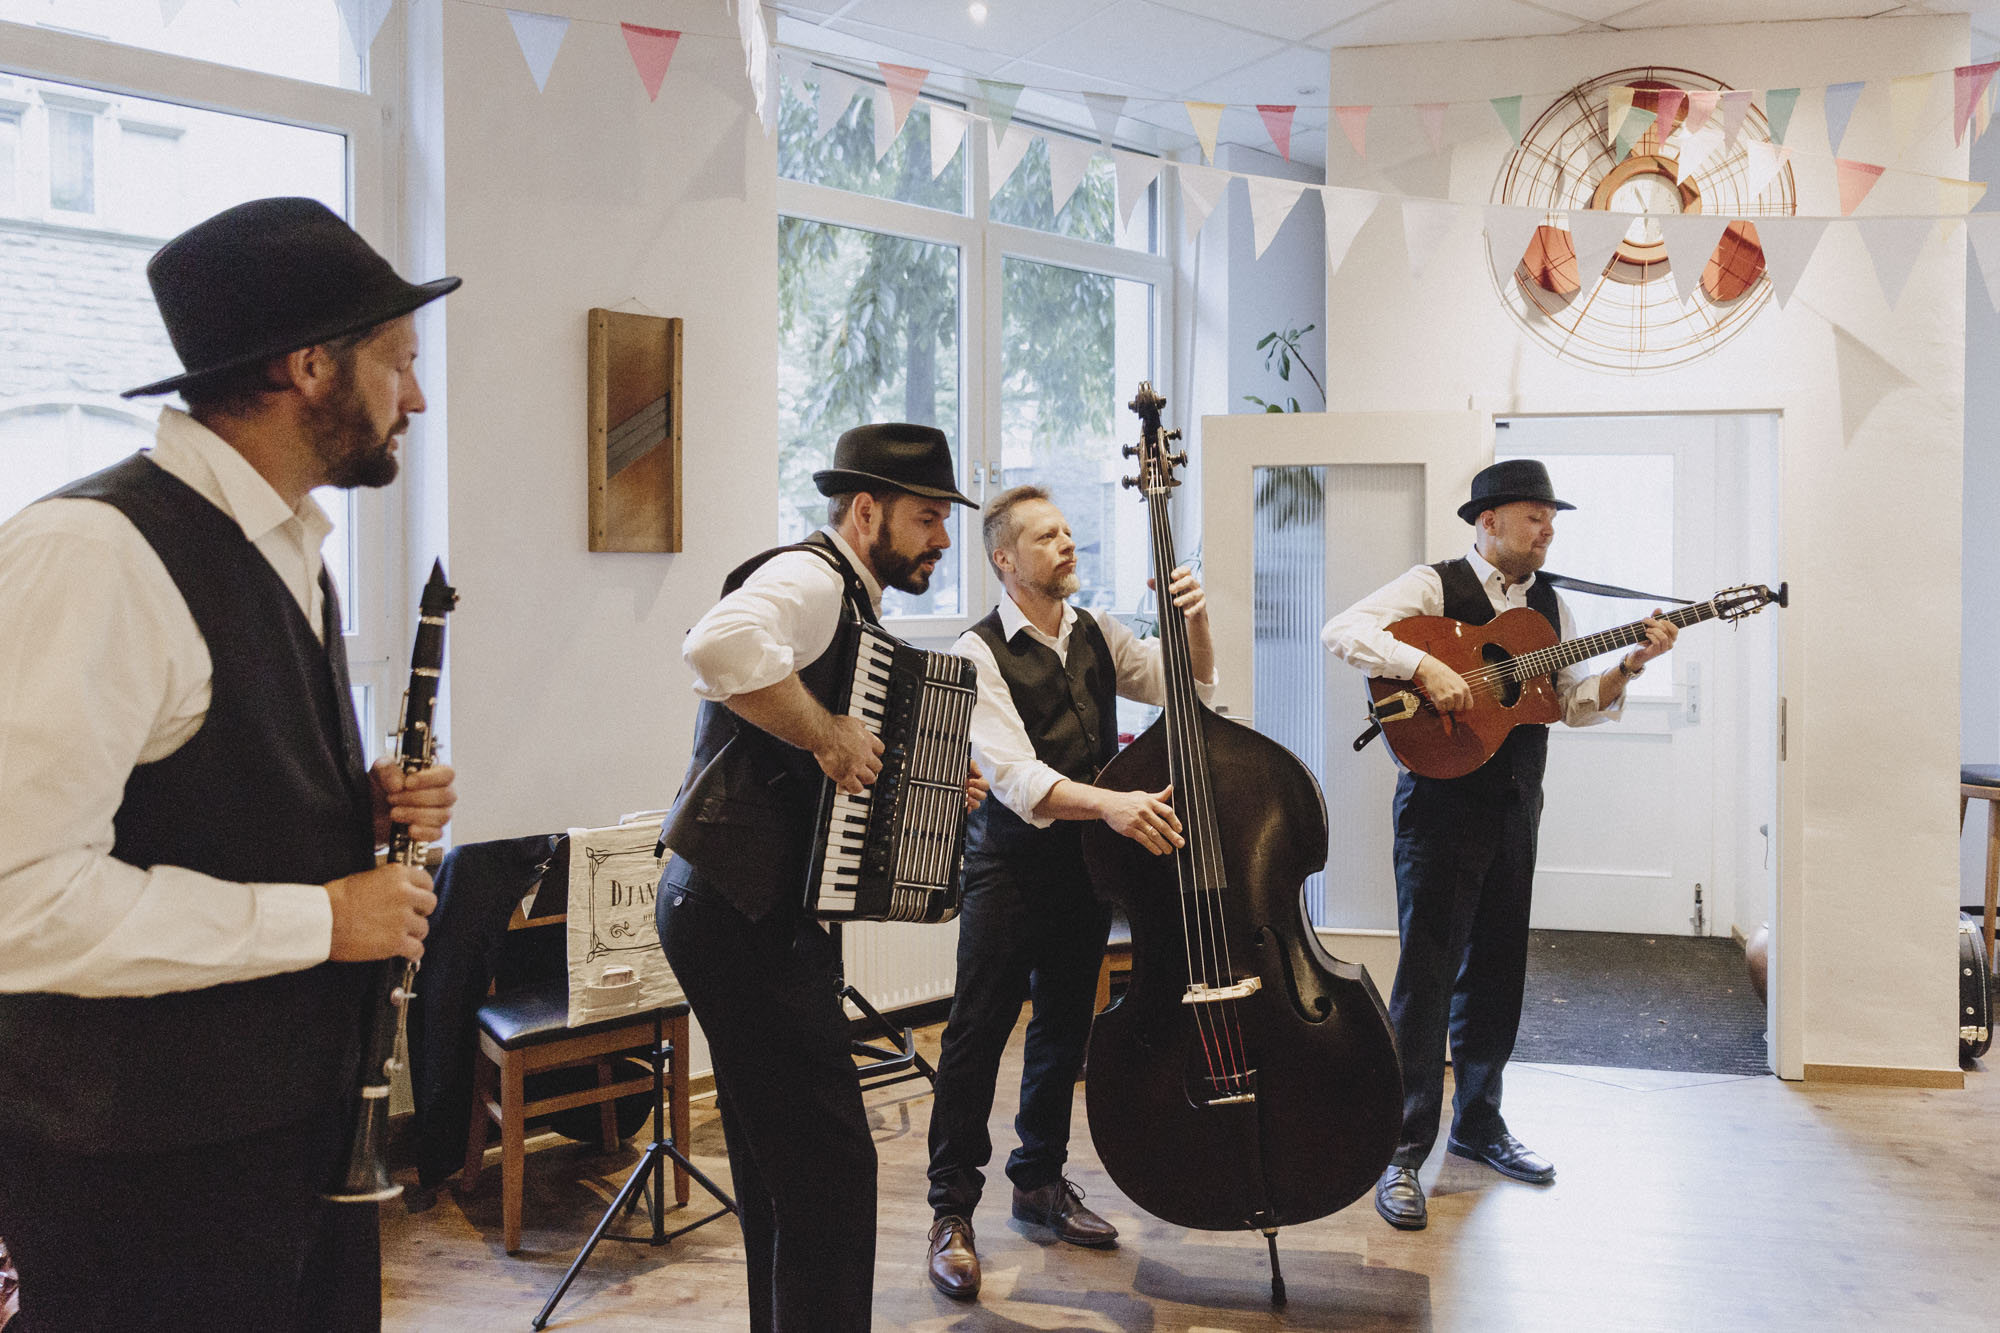 Hochzeitsfotografie-Karlsruhe-Ronja-Flo-50